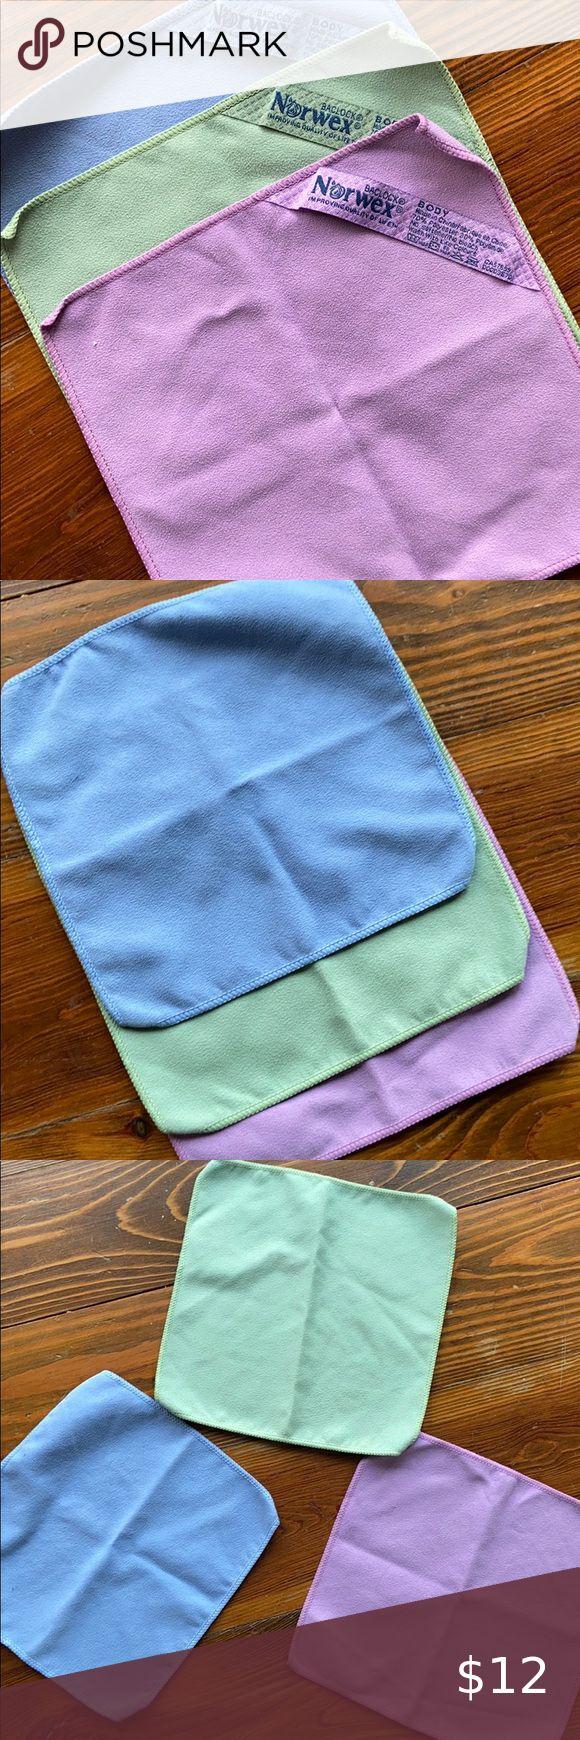 Norwex Body cloth in 2020 Norwex body cloths, Body